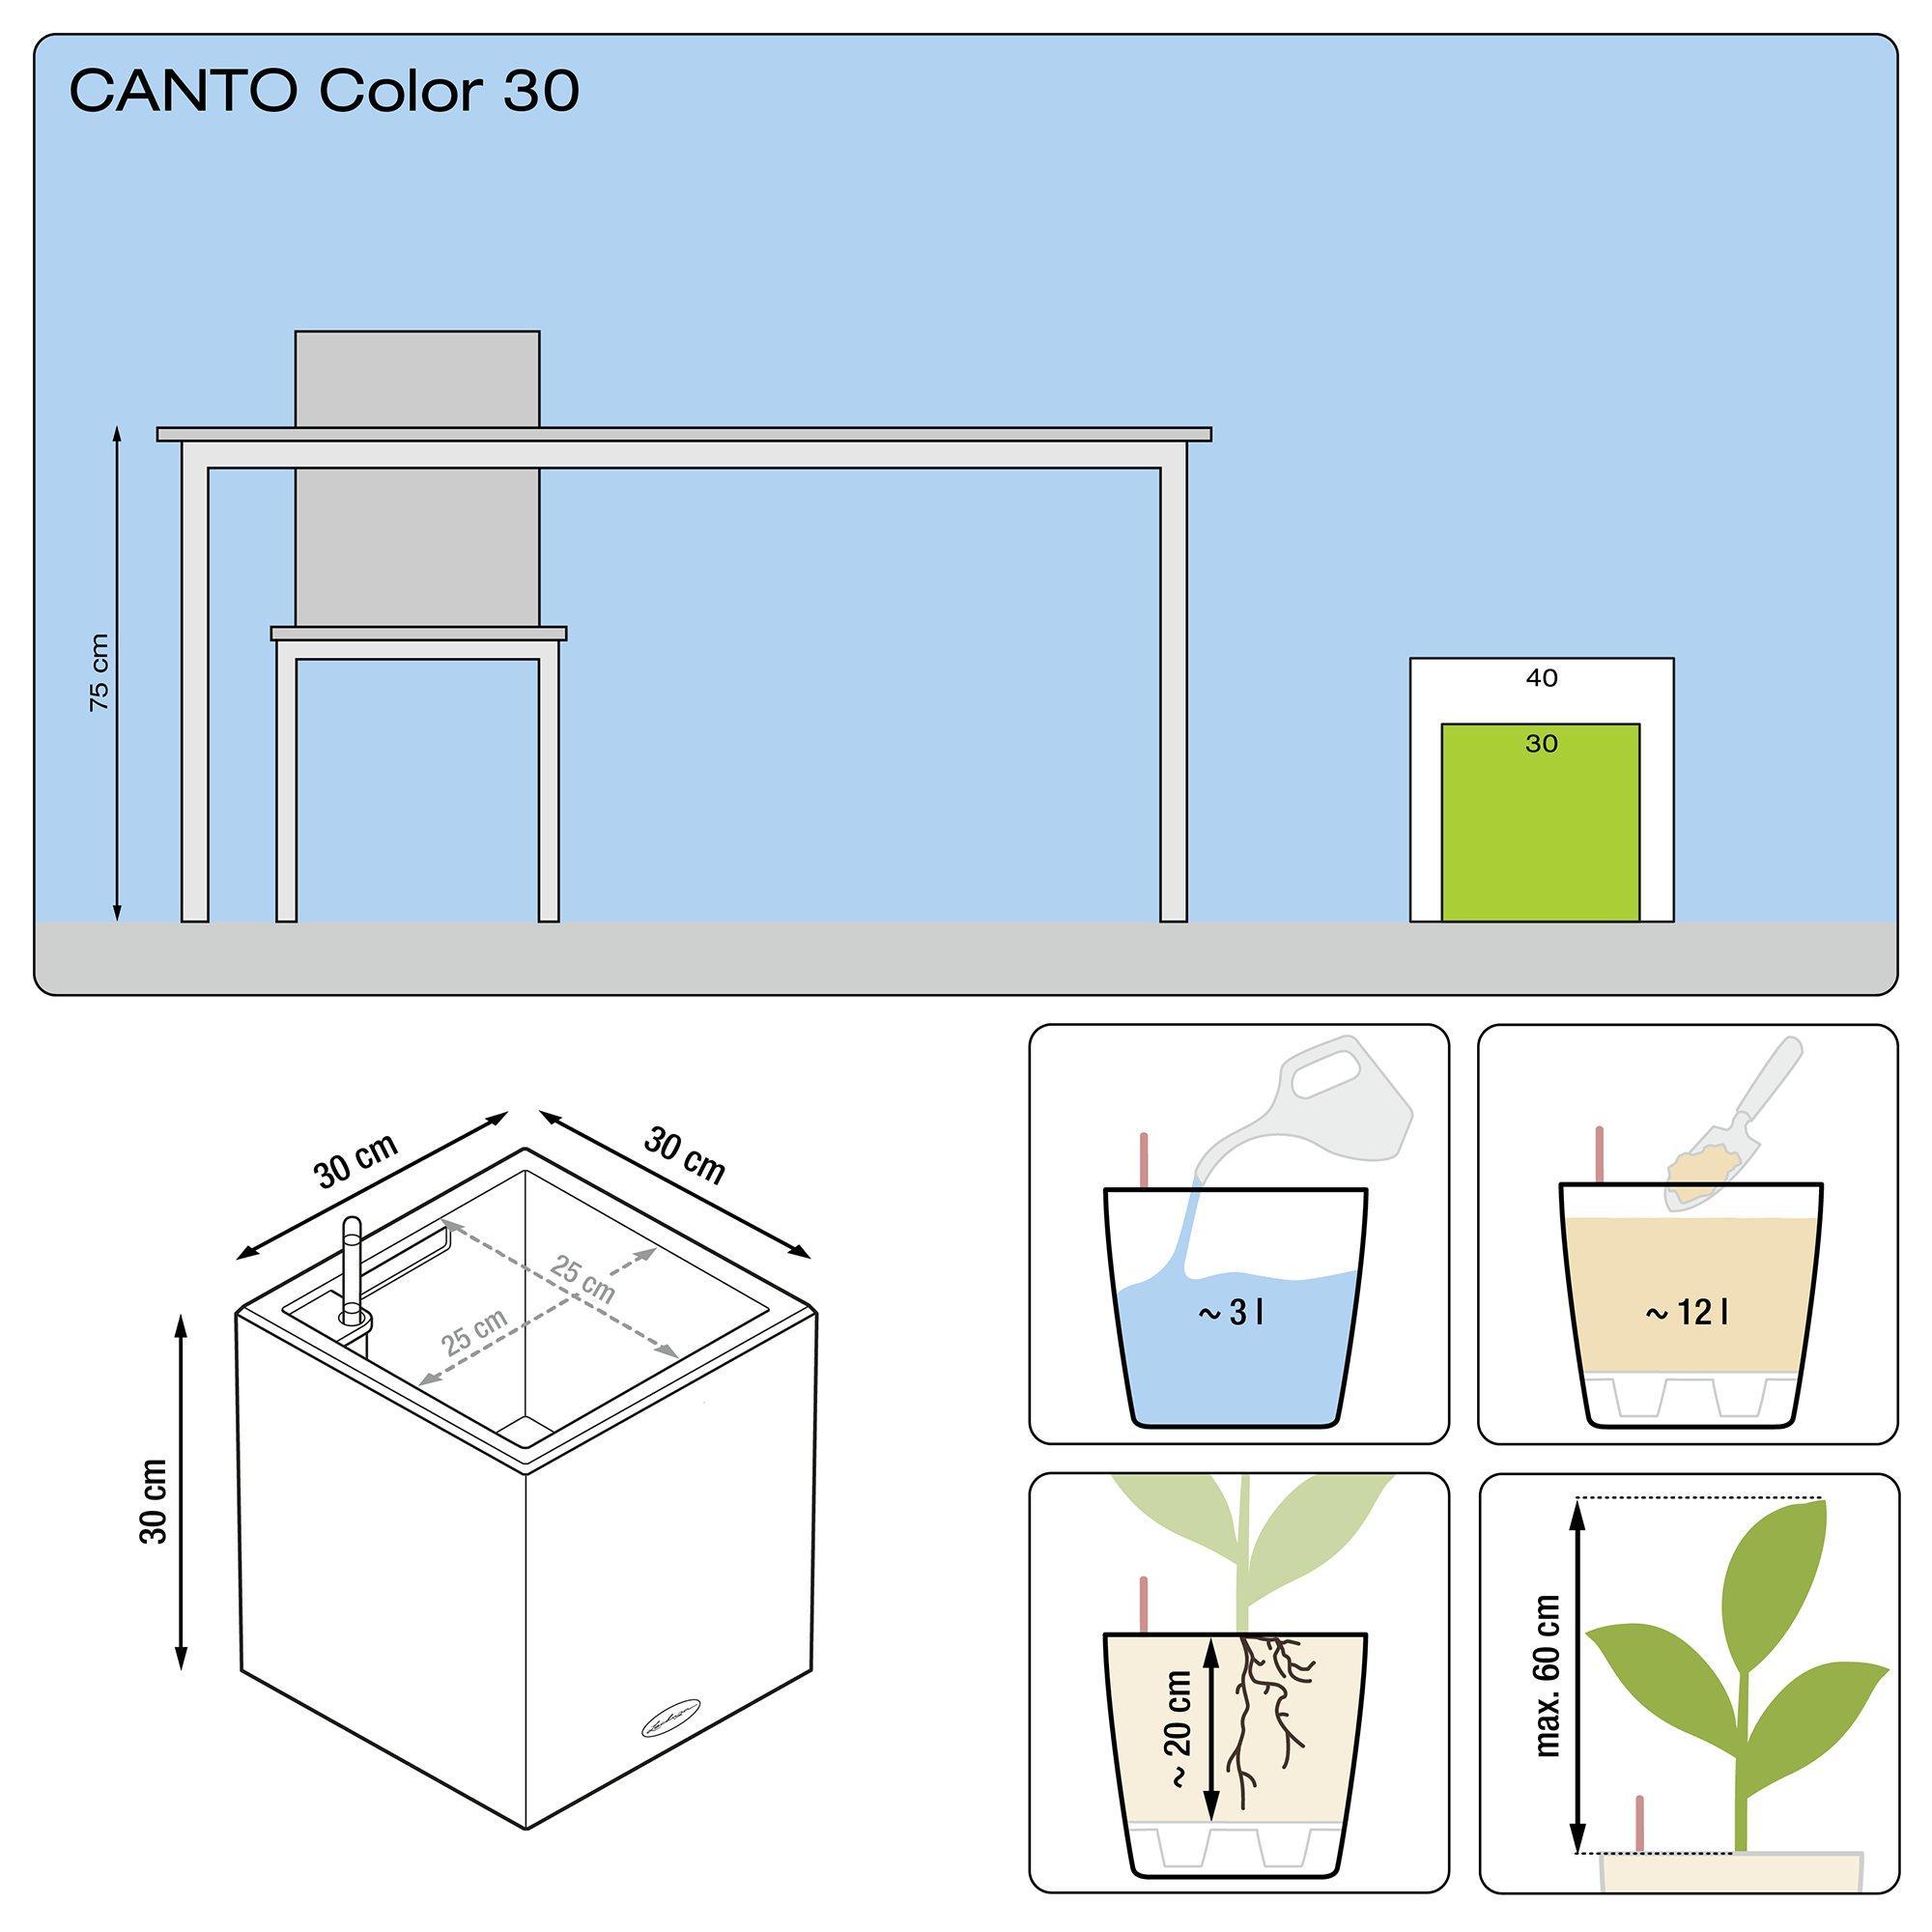 CANTO Color cubo 30 beige arena - Imagen 3